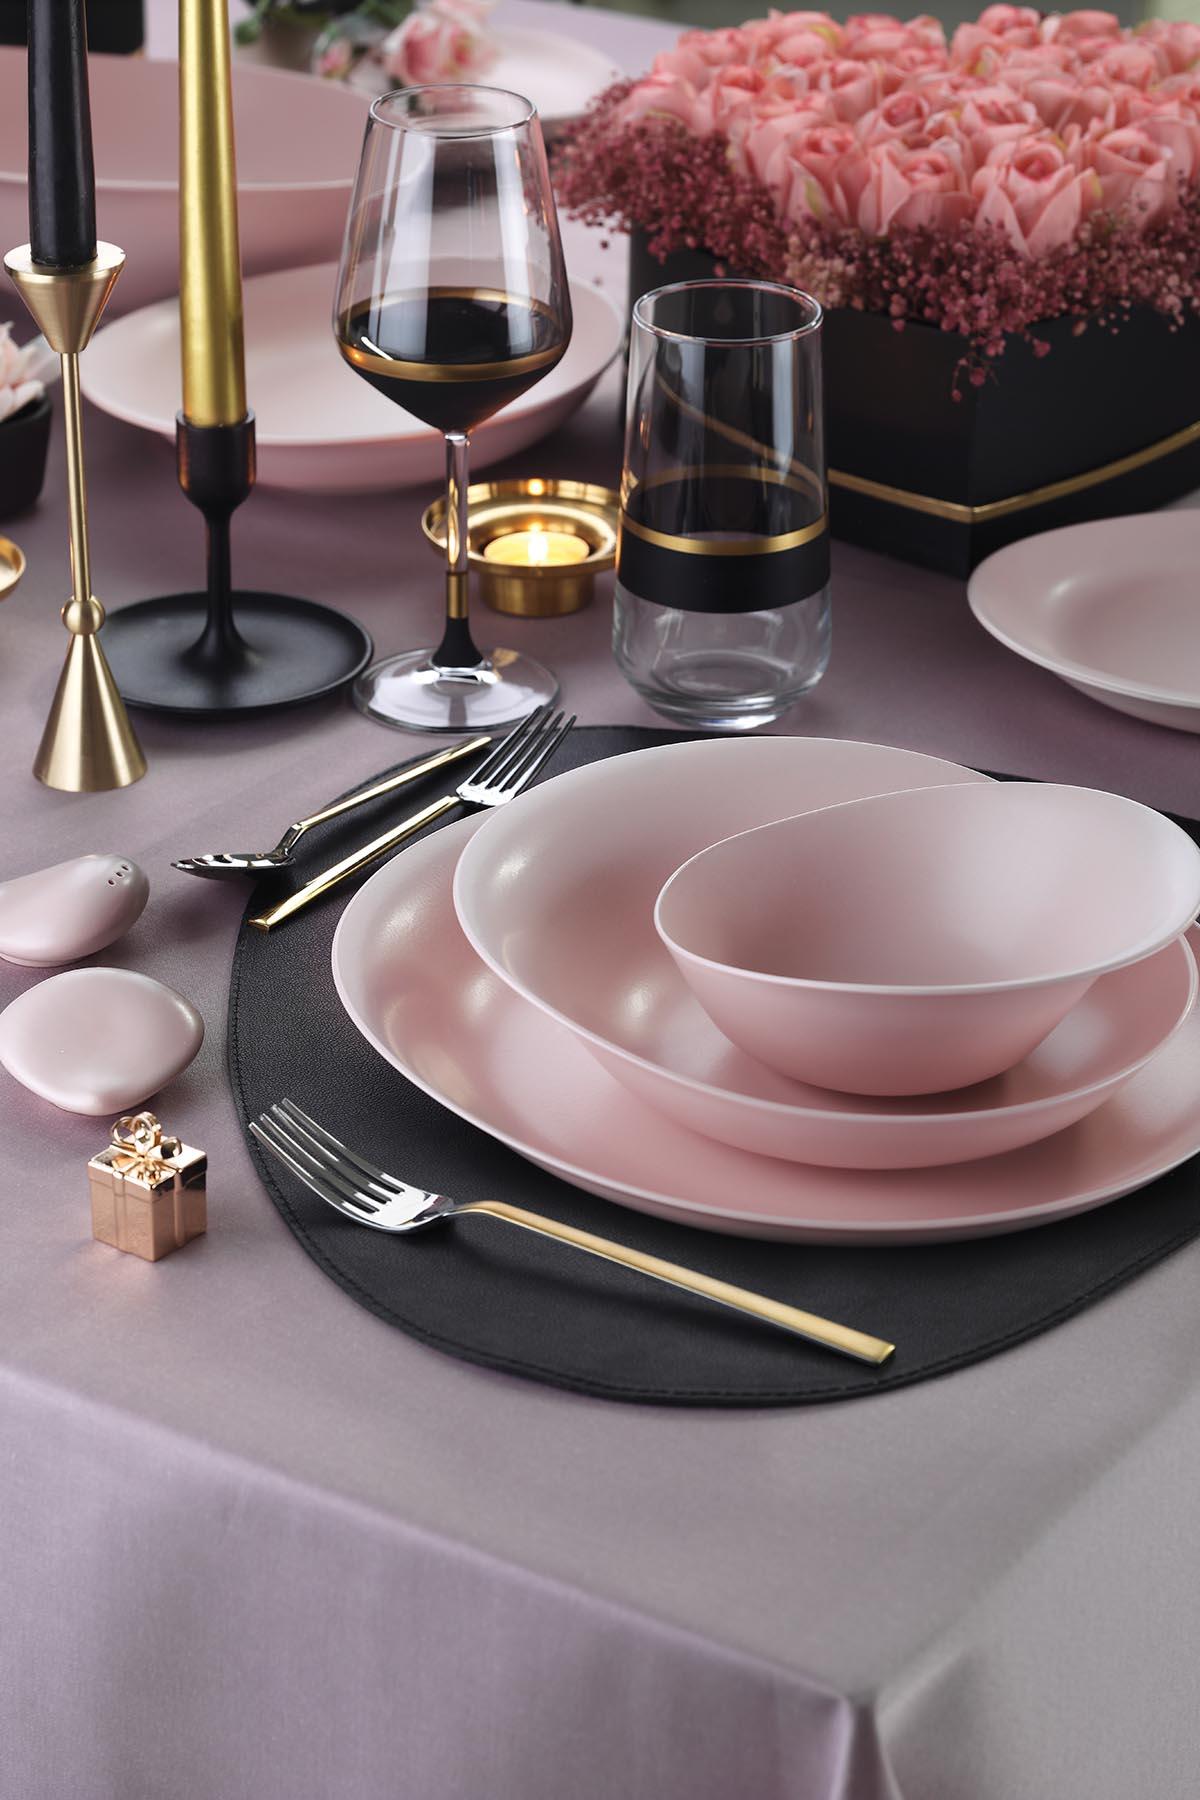 Kütahya Porselen Rosa 29 Parça Yemek Takımı Mat Pembe